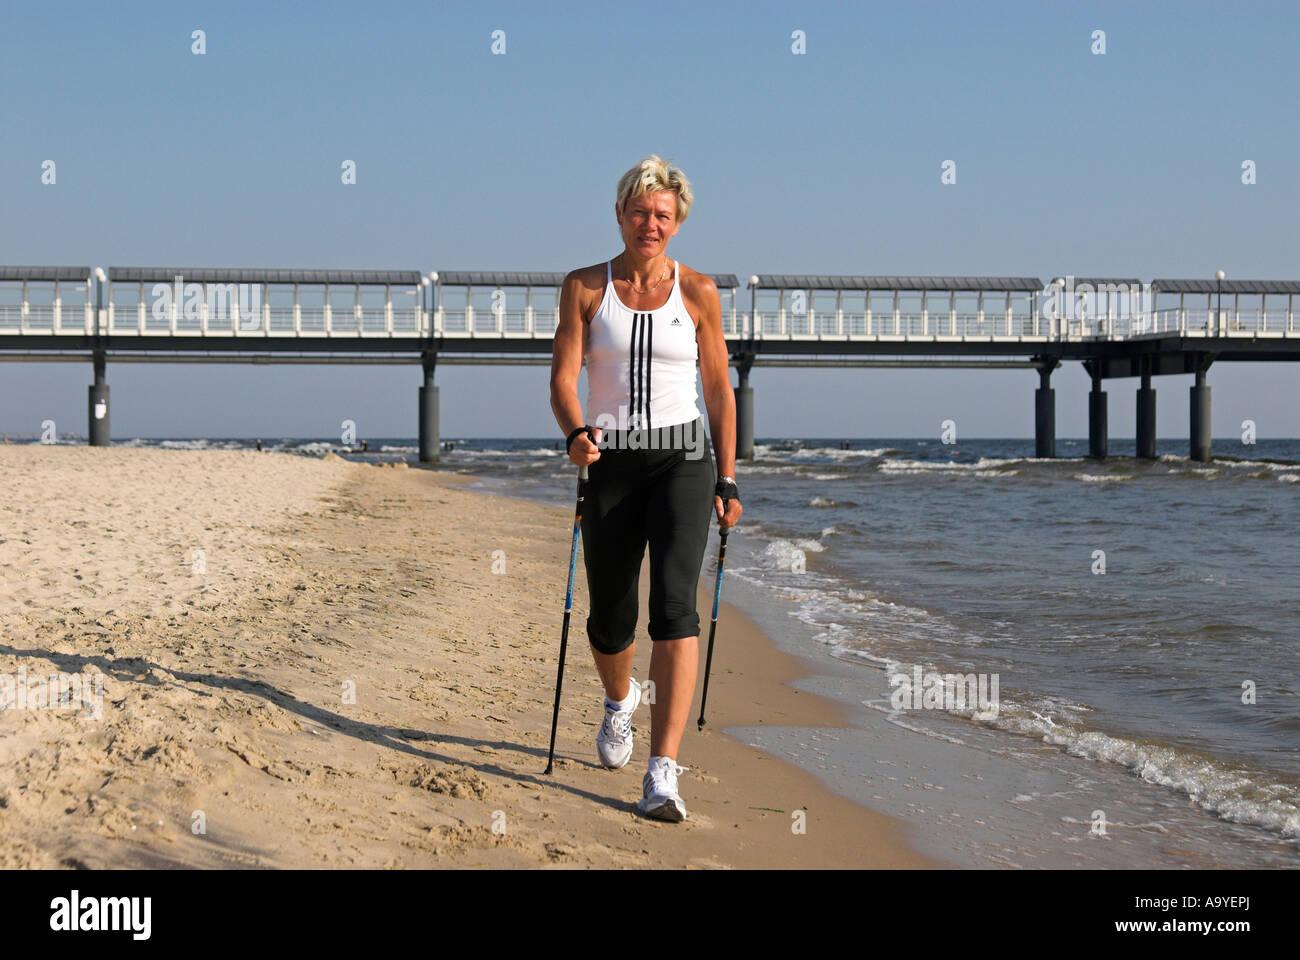 Personal trainer Sabine John at the beach of Heringsdorf, Usedom island, Mecklenburg Western Pomerania, Germany, Stock Photo